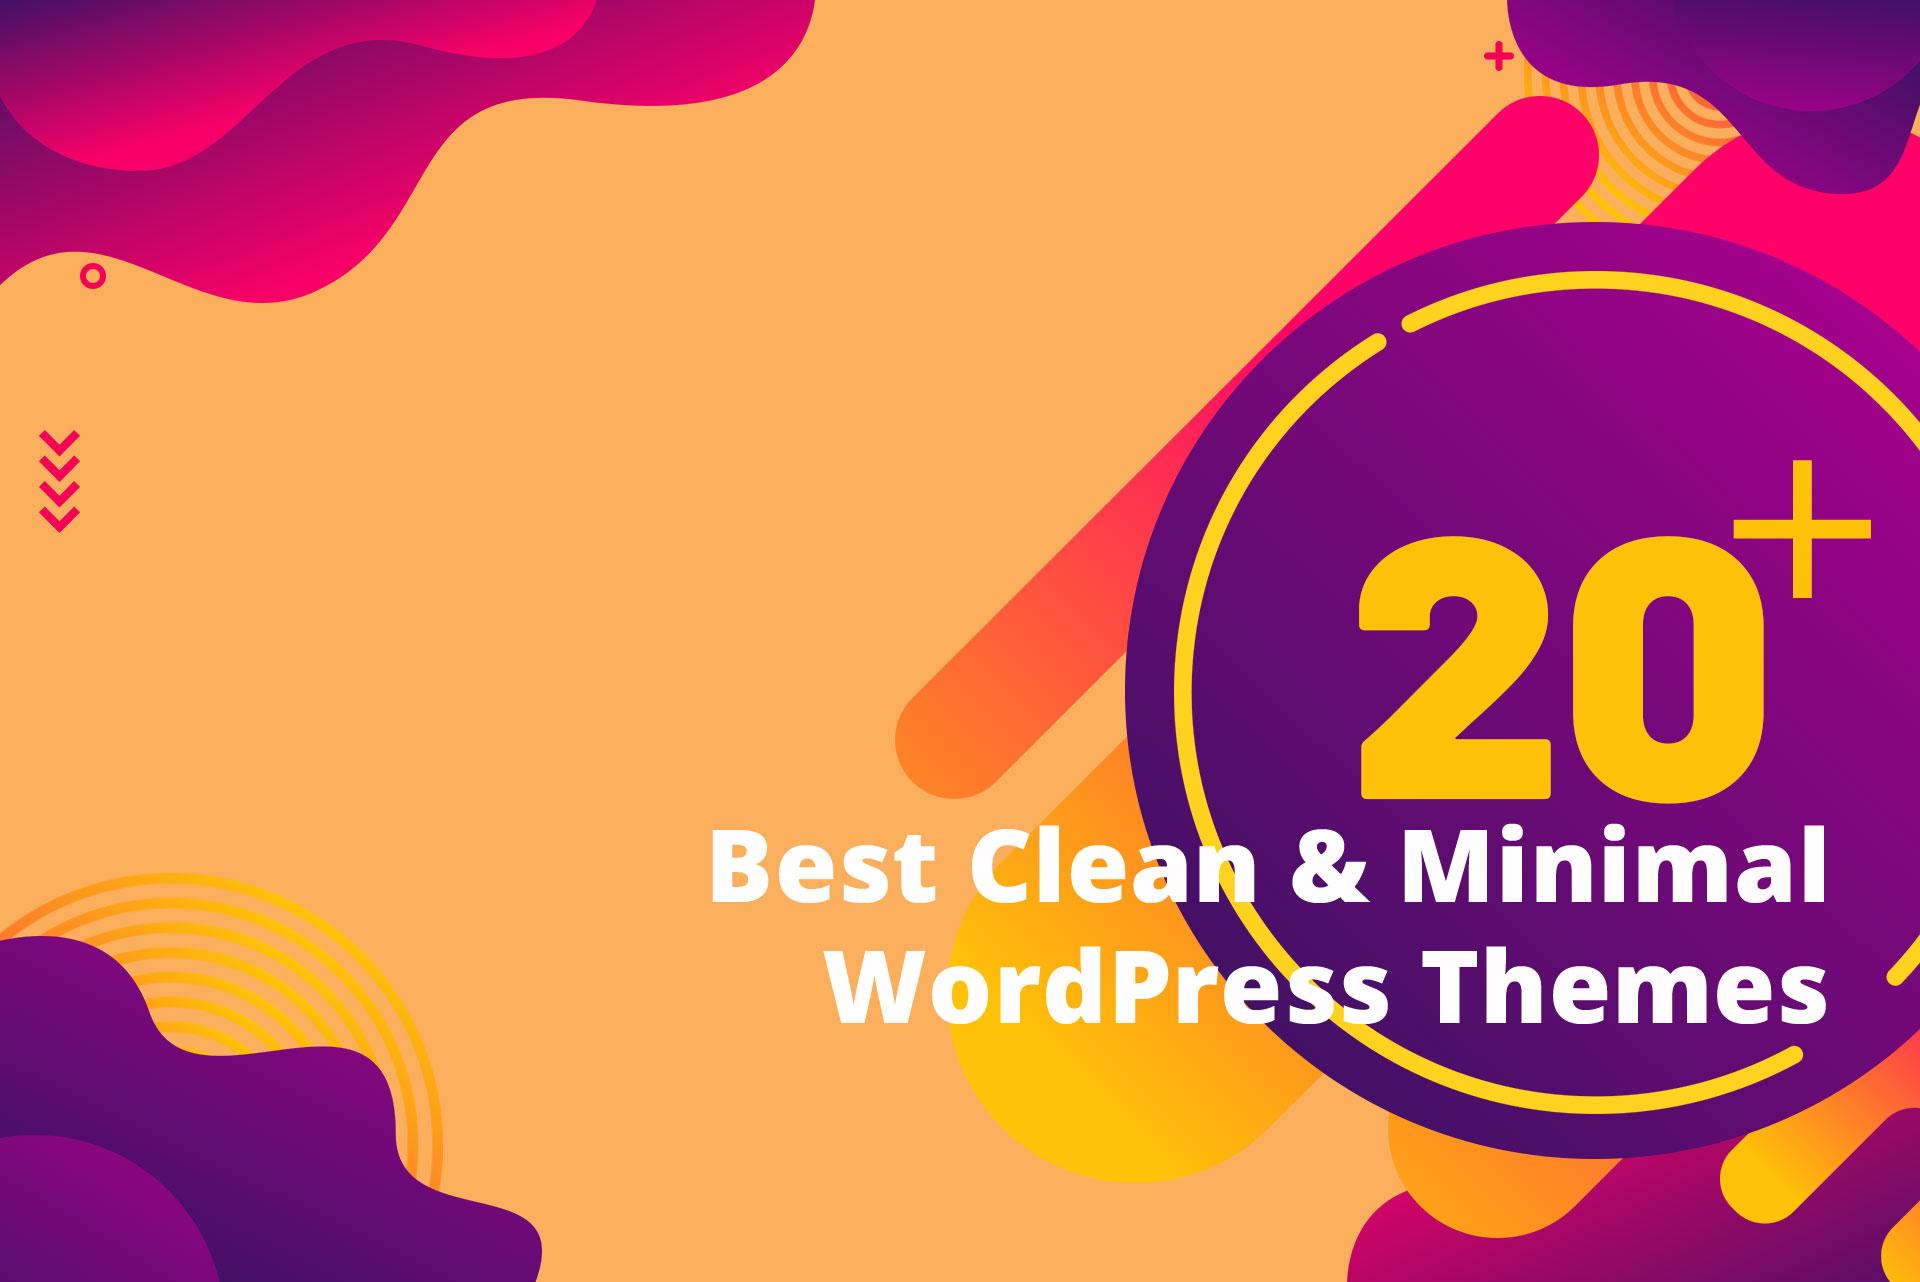 20+ Best Clean & Minimal WordPress Themes